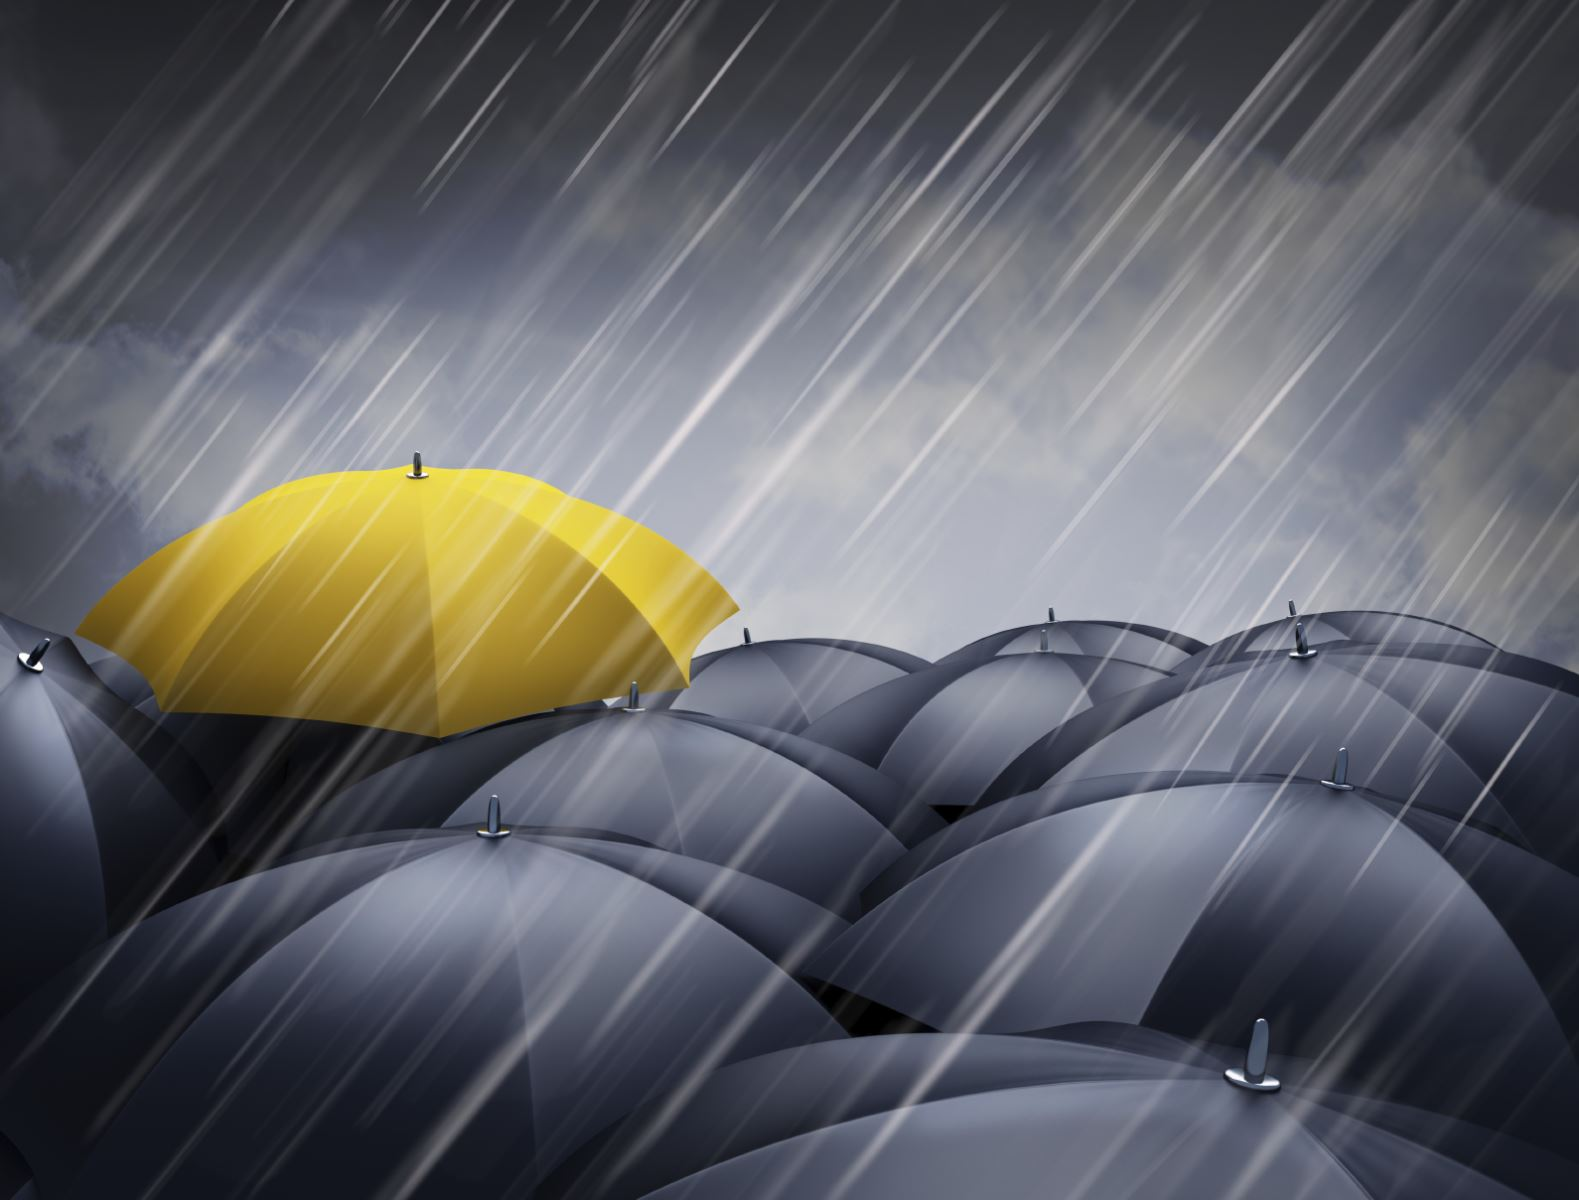 The Yellow Wallpaper Important Quotes Truenorth Companies Truenorth Provides Sound Business